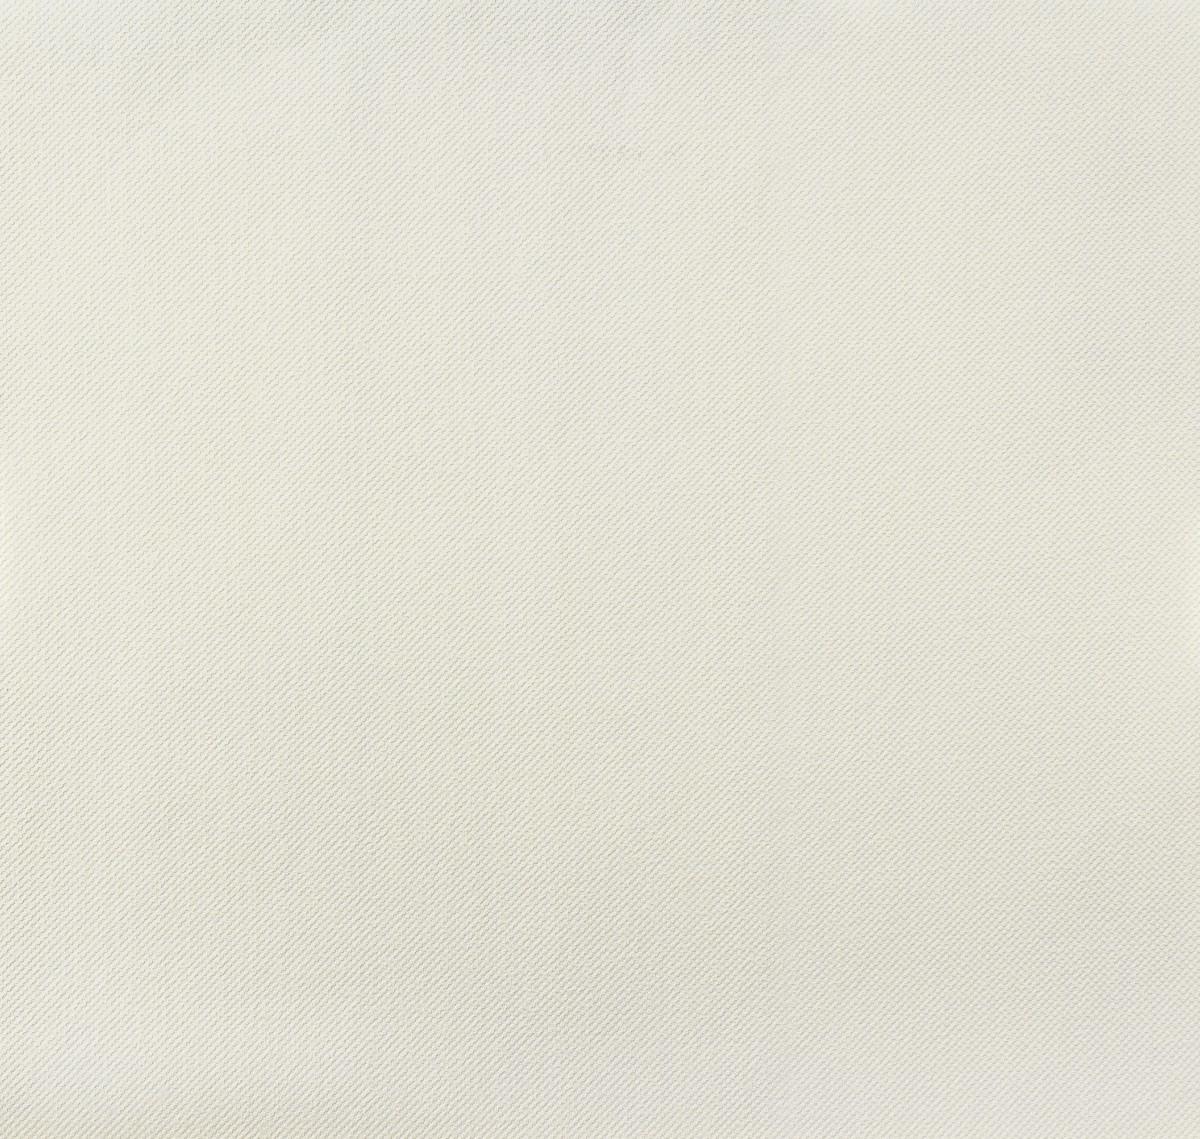 tapete michalsky metropolis uni wei 93929 1. Black Bedroom Furniture Sets. Home Design Ideas